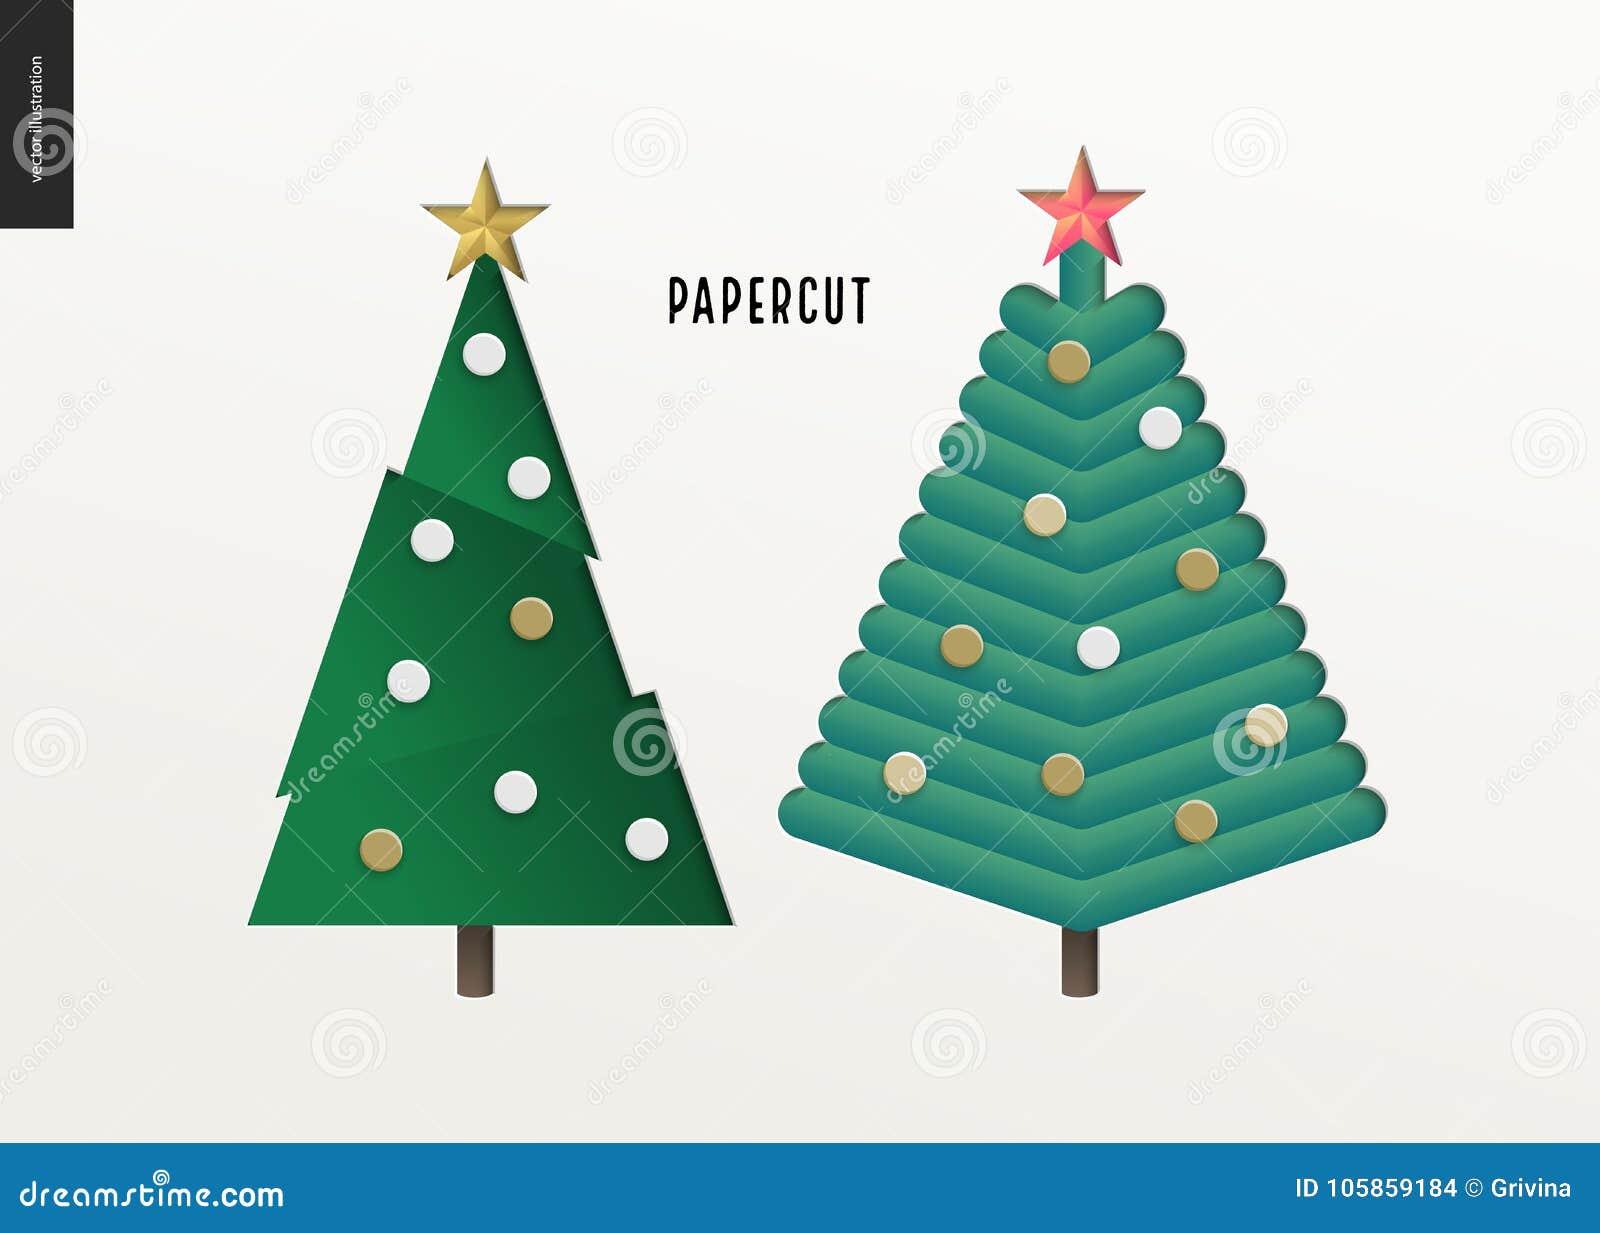 Papercut - Christmas Trees Set Stock Vector - Illustration of ...